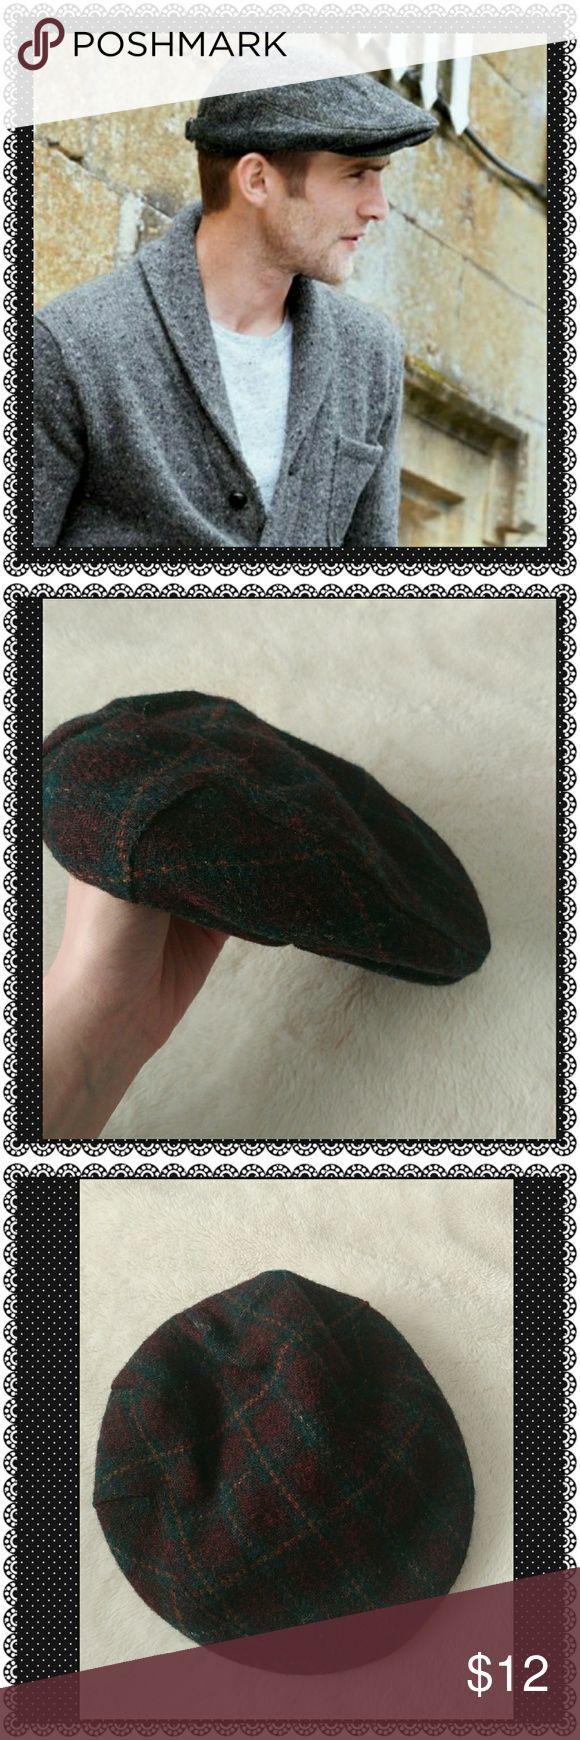 Men's Wool Hat Men's plaid wool hat Accessories Hats